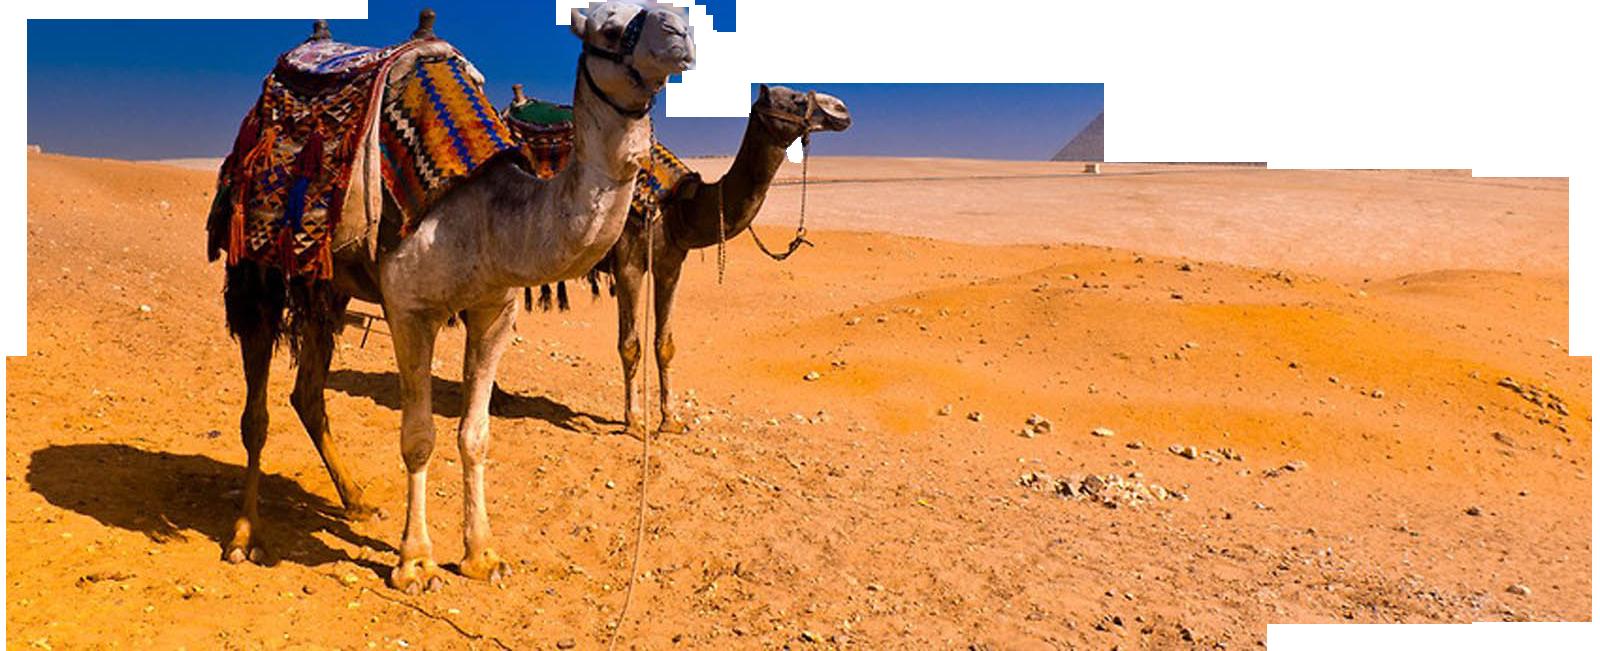 PNG File Name: Camel PlusPng.com  - Camel PNG